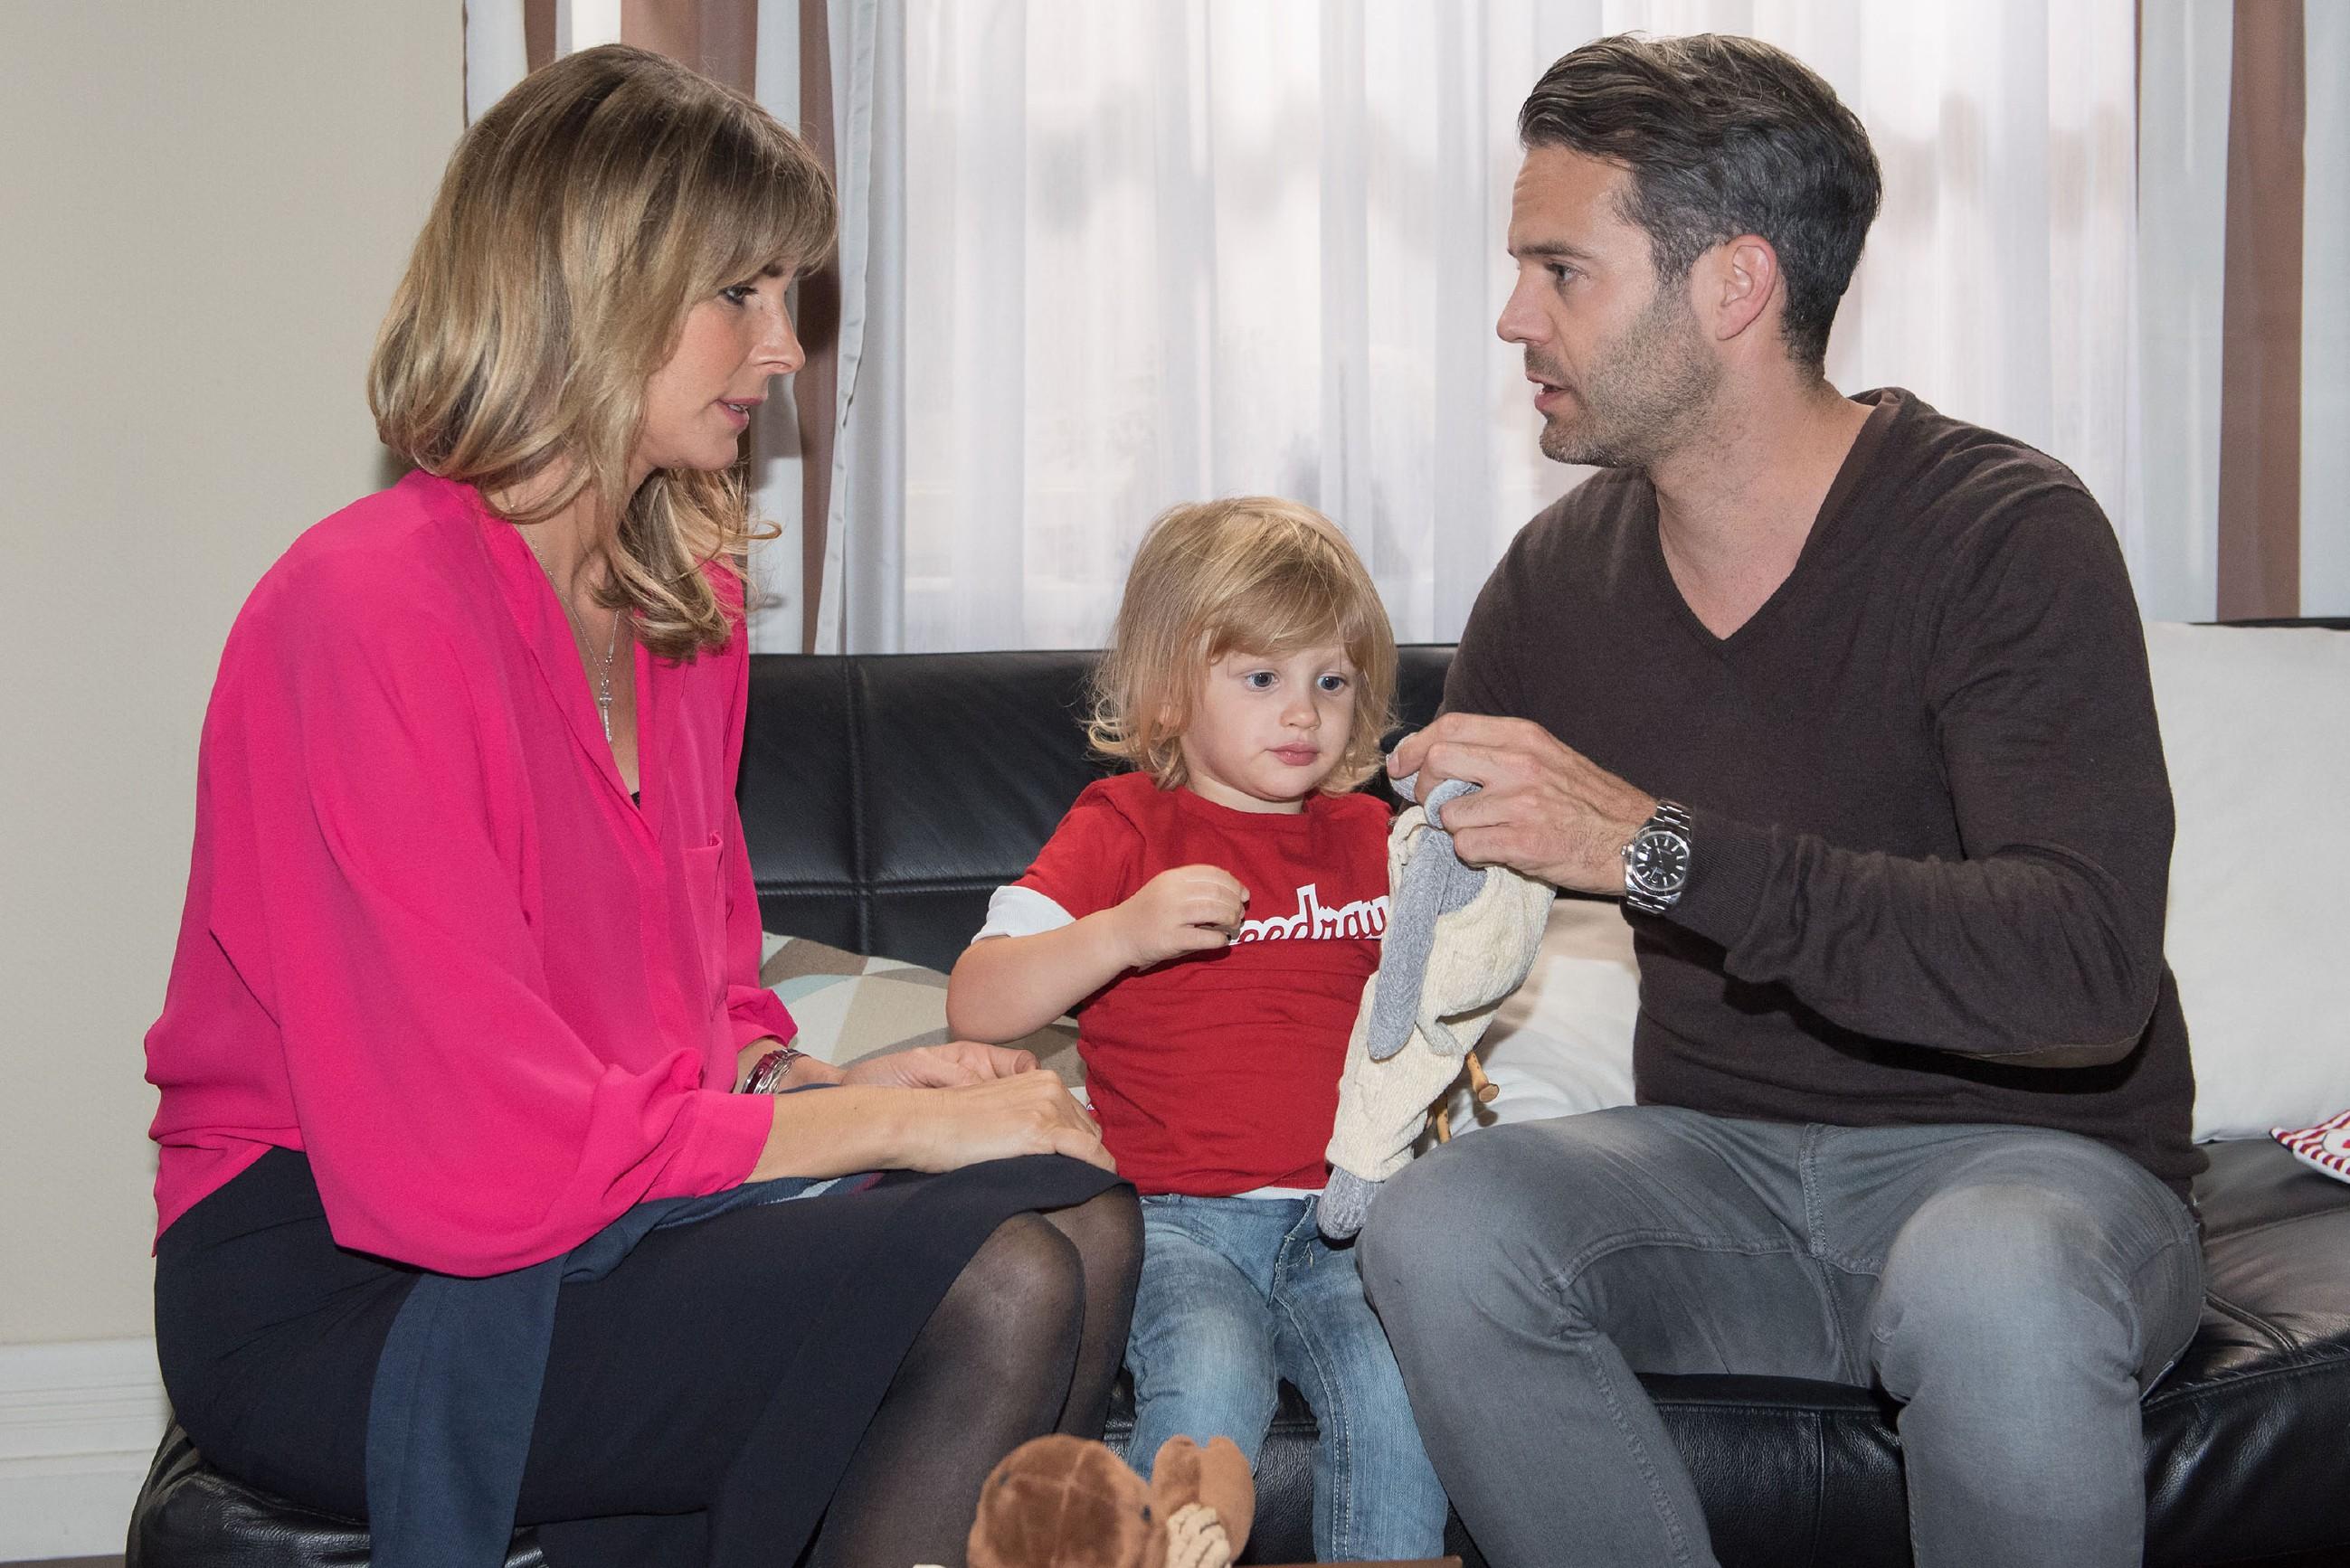 Till (Ben Ruedinger, r.) nimmt Evas (Claudelle Deckert) Sorge um Noah (Finn Luca Cramer) ernst. (Quelle: RTL / Stefan Behrens)